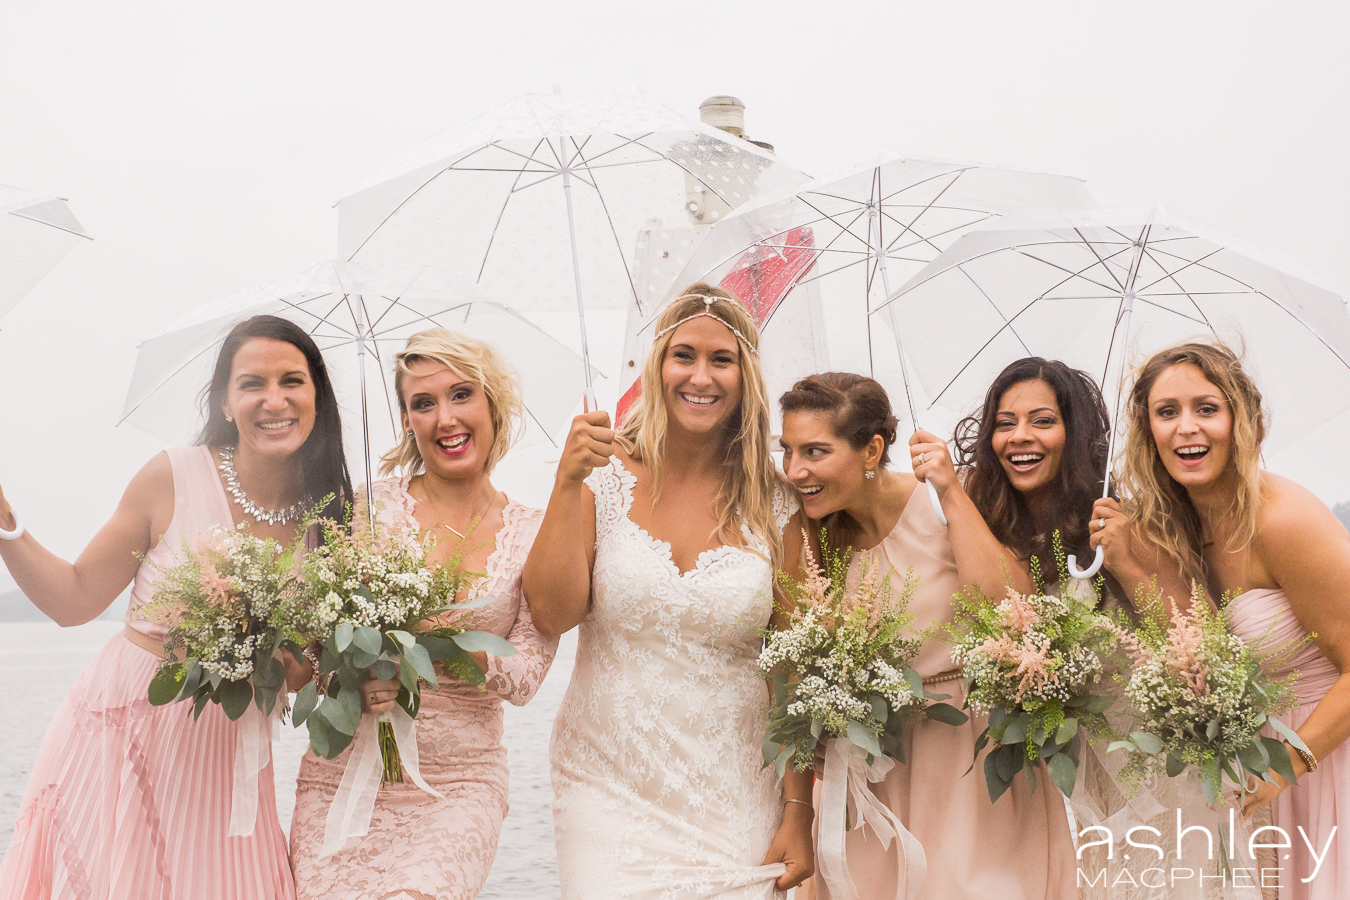 Ashley MacPhee Photography Hudson Yacht Club wedding photographer (69 of 112).jpg